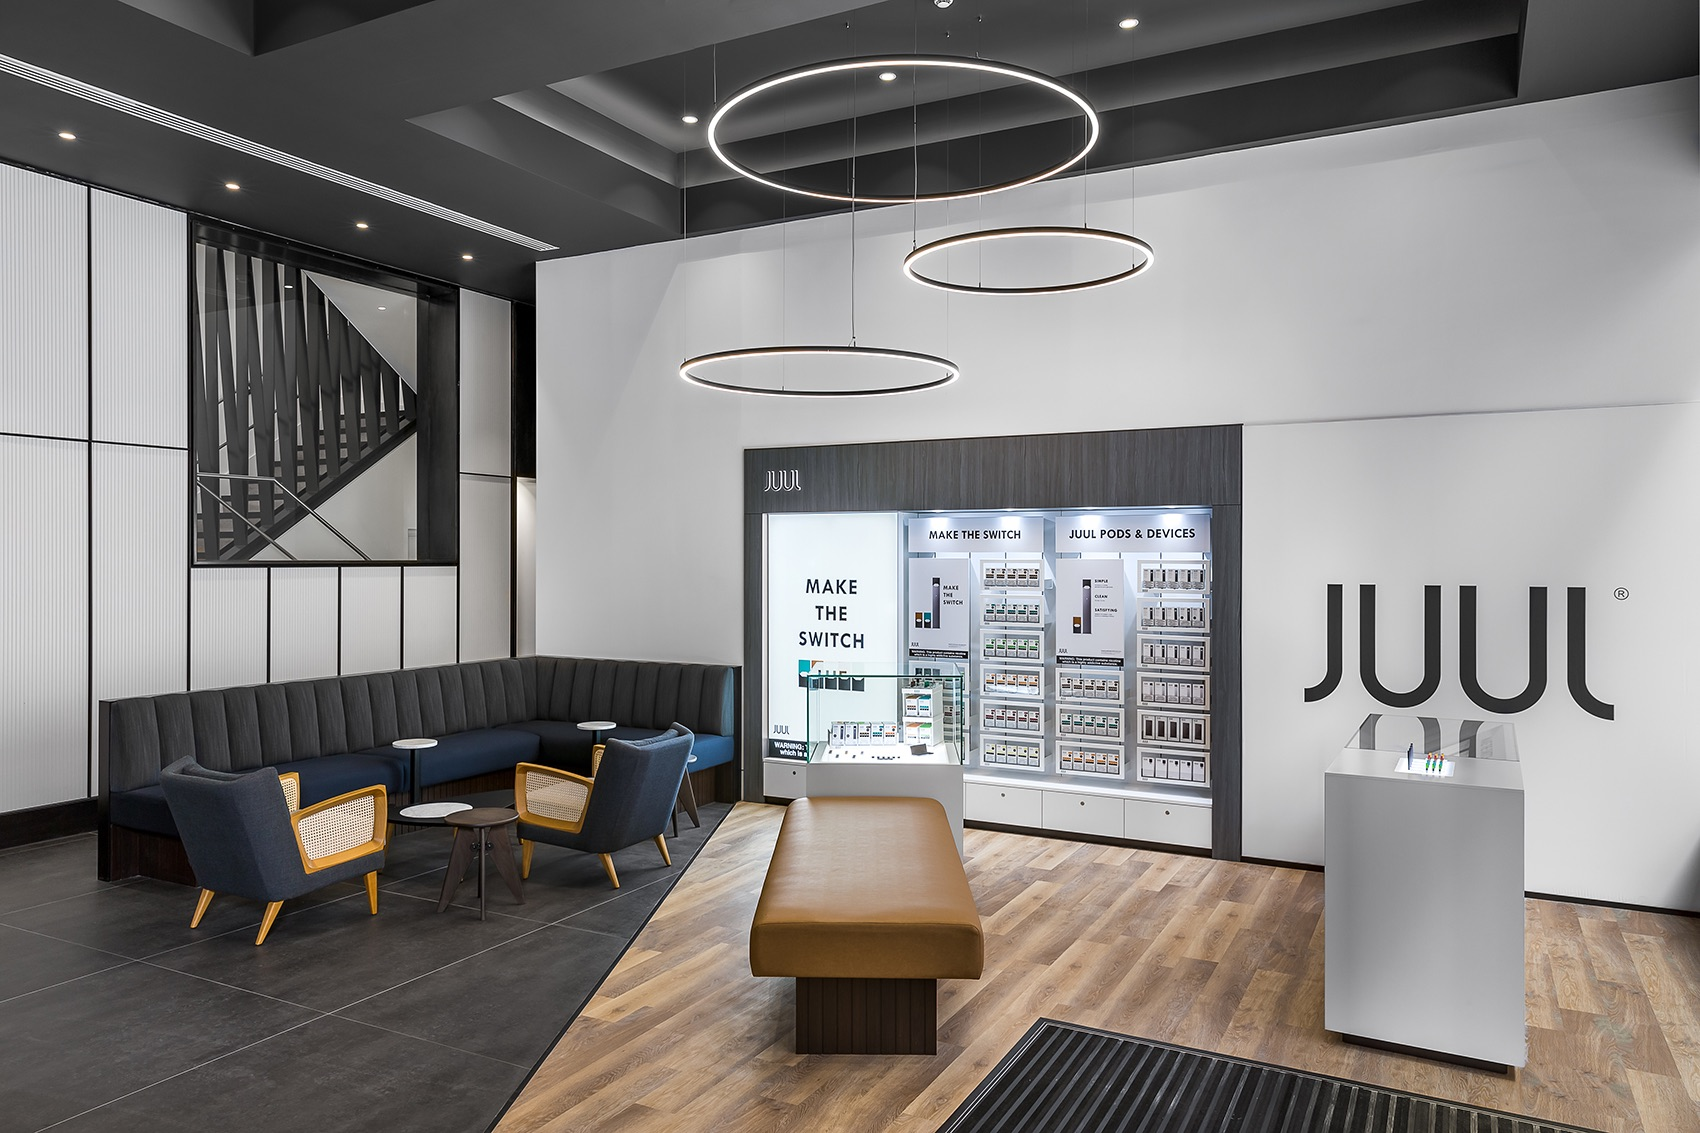 JUUL在上海北京这些一线城市有实体店没有。